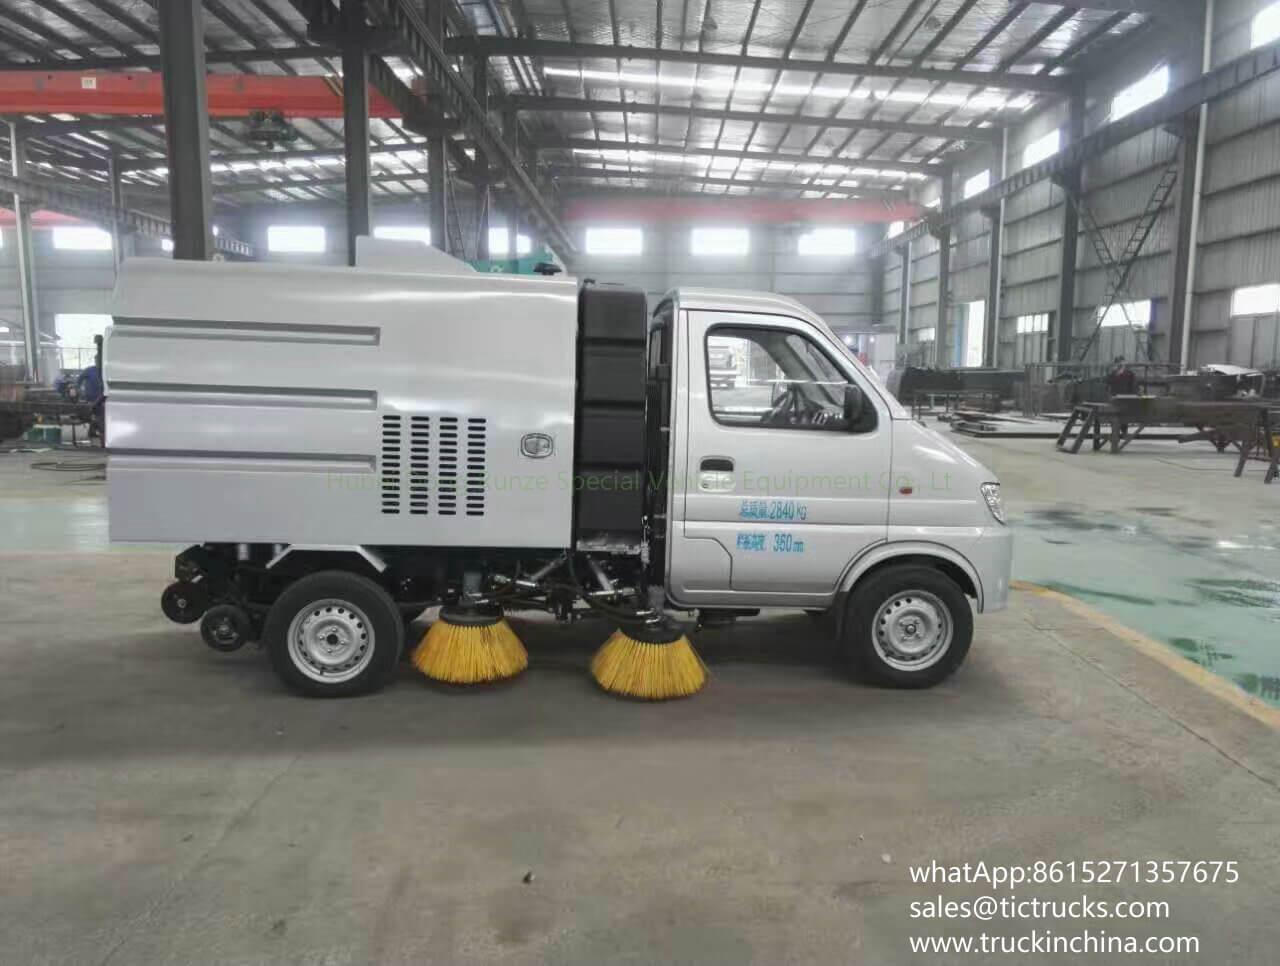 Mini balayeuse de route de la balayeuse vehicle-02T- de Changan trucks_1